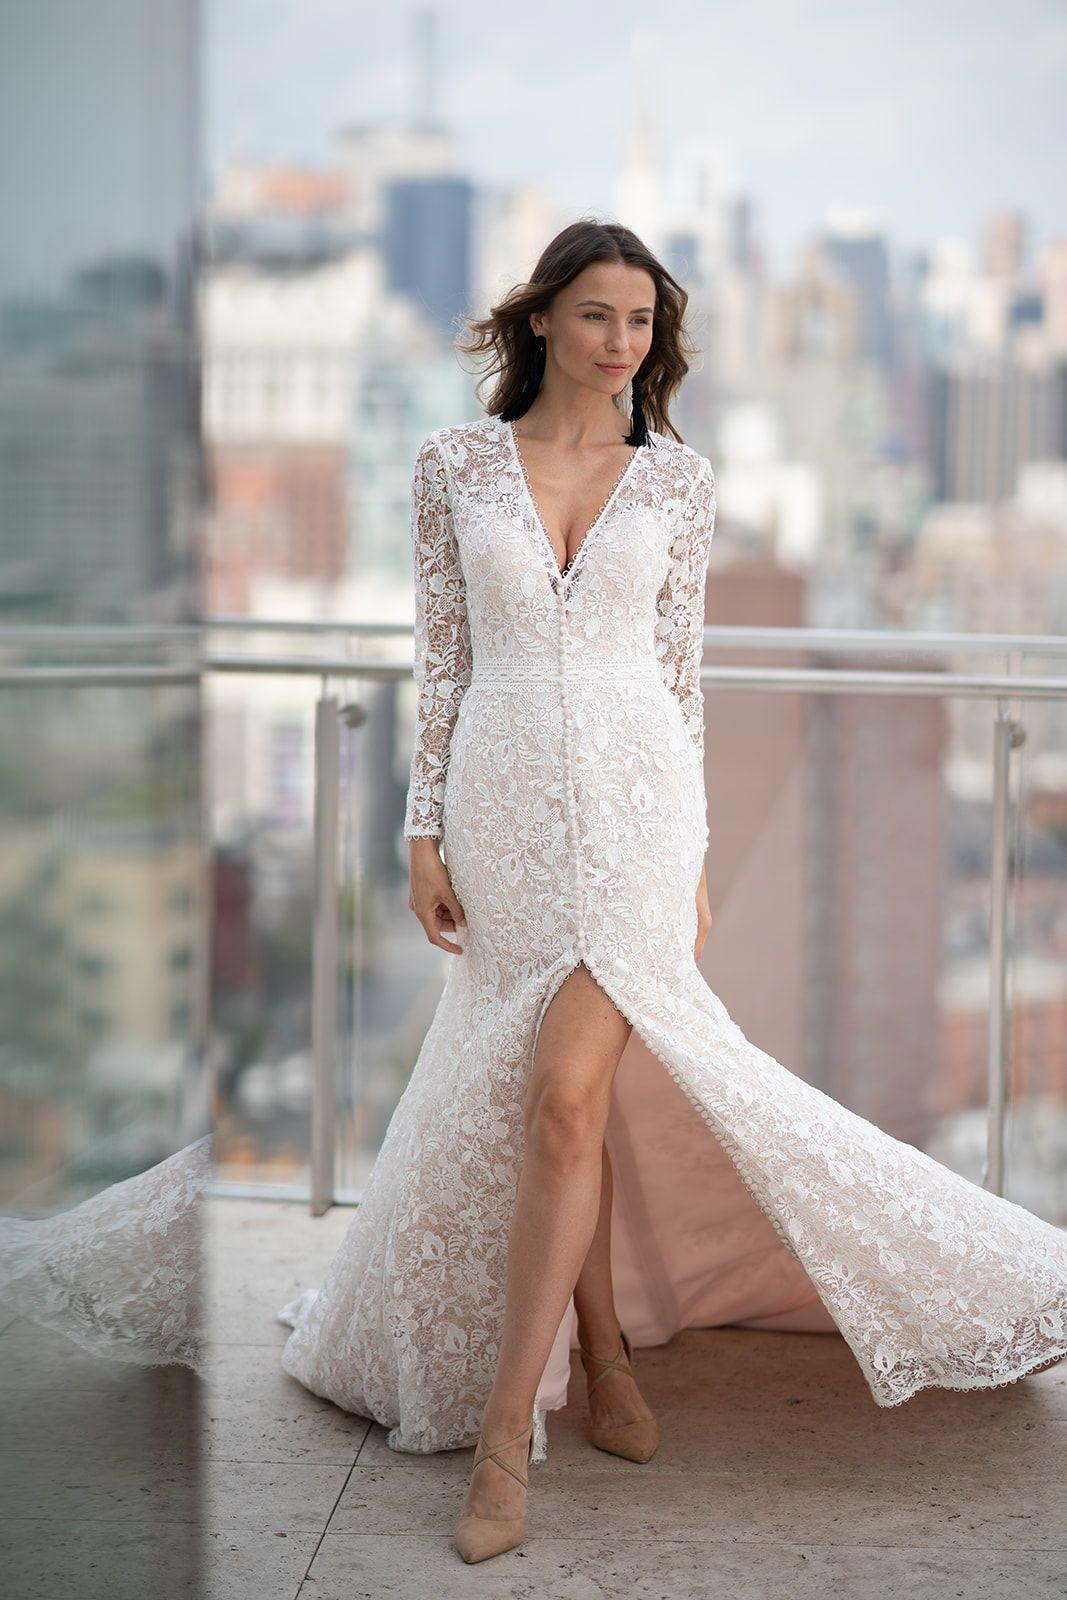 Weddings & Events Self-Conscious 2019 New Vintage Mermaid Lace Wedding Dresses V Neck Sweep Train Long Reception Bridal Gowns Informal Boho Robe De Mariee